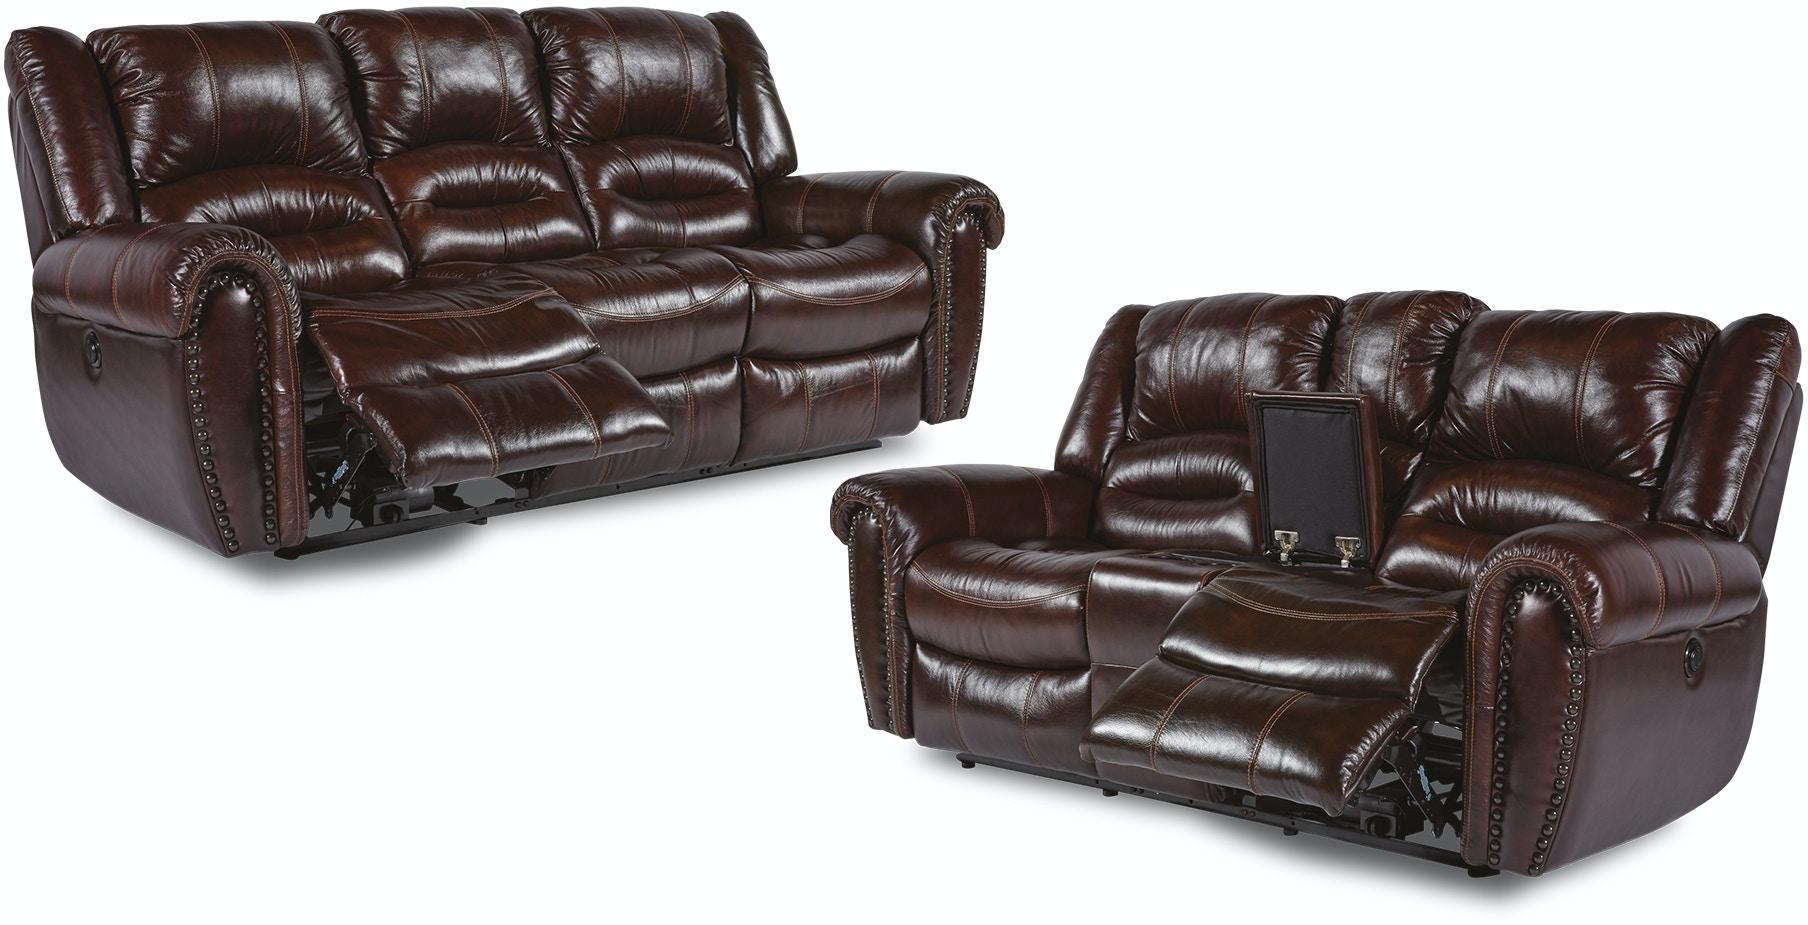 Flexsteel Living Room Bricktown Reclining Sofa And Loveseat ~ Traditional Reclining Sofa